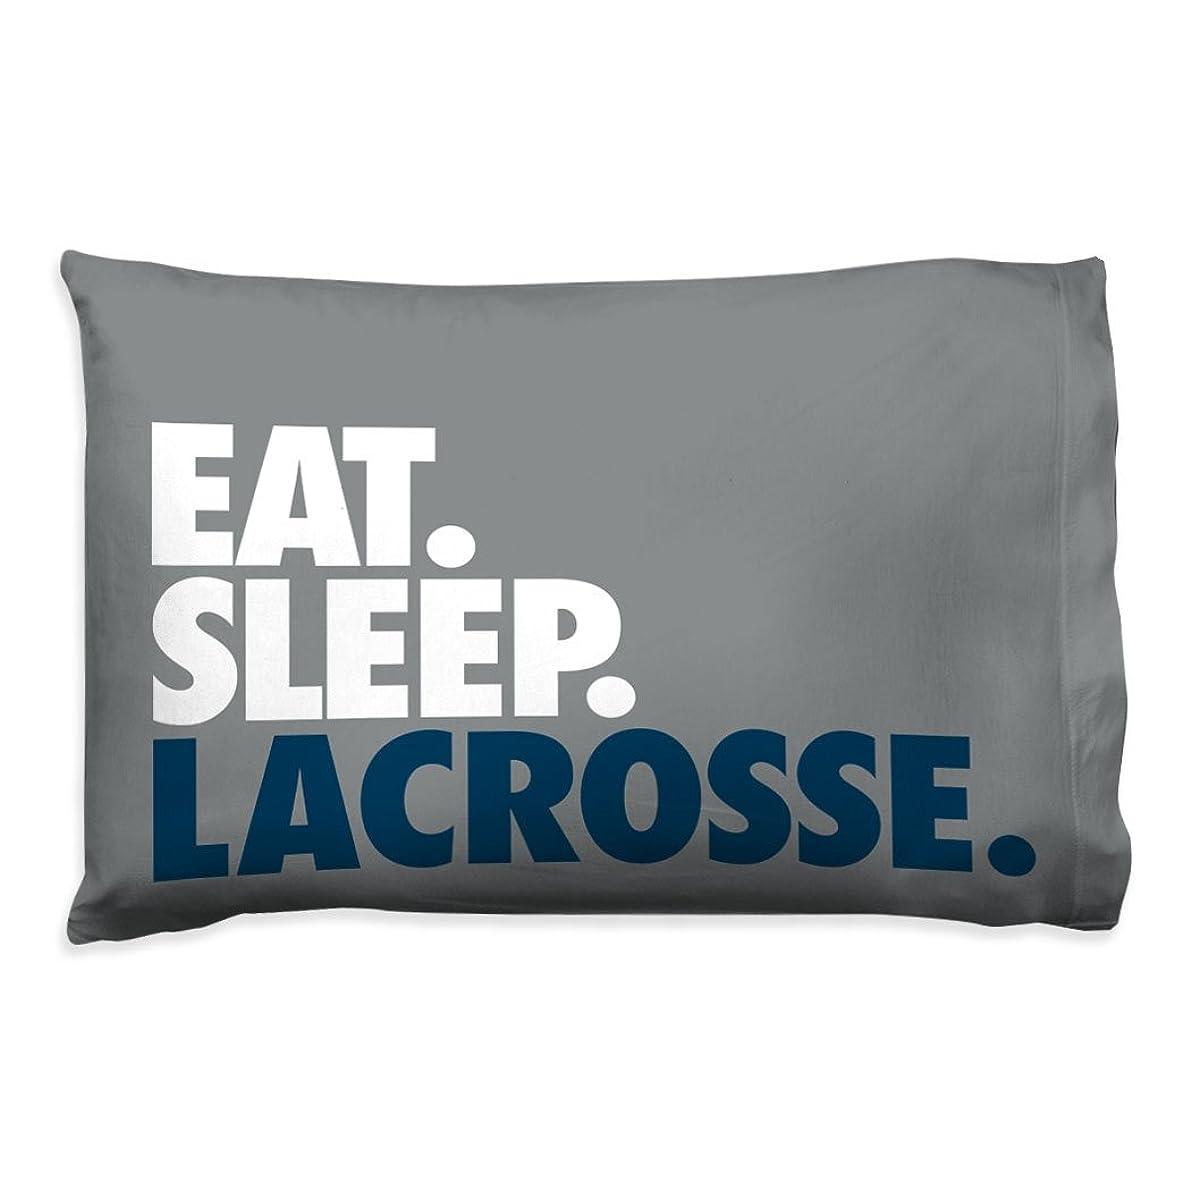 Eat Sleep Lacrosse Pillowcase | Guys Lacrosse Pillows by ChalkTalk Sports | Gray